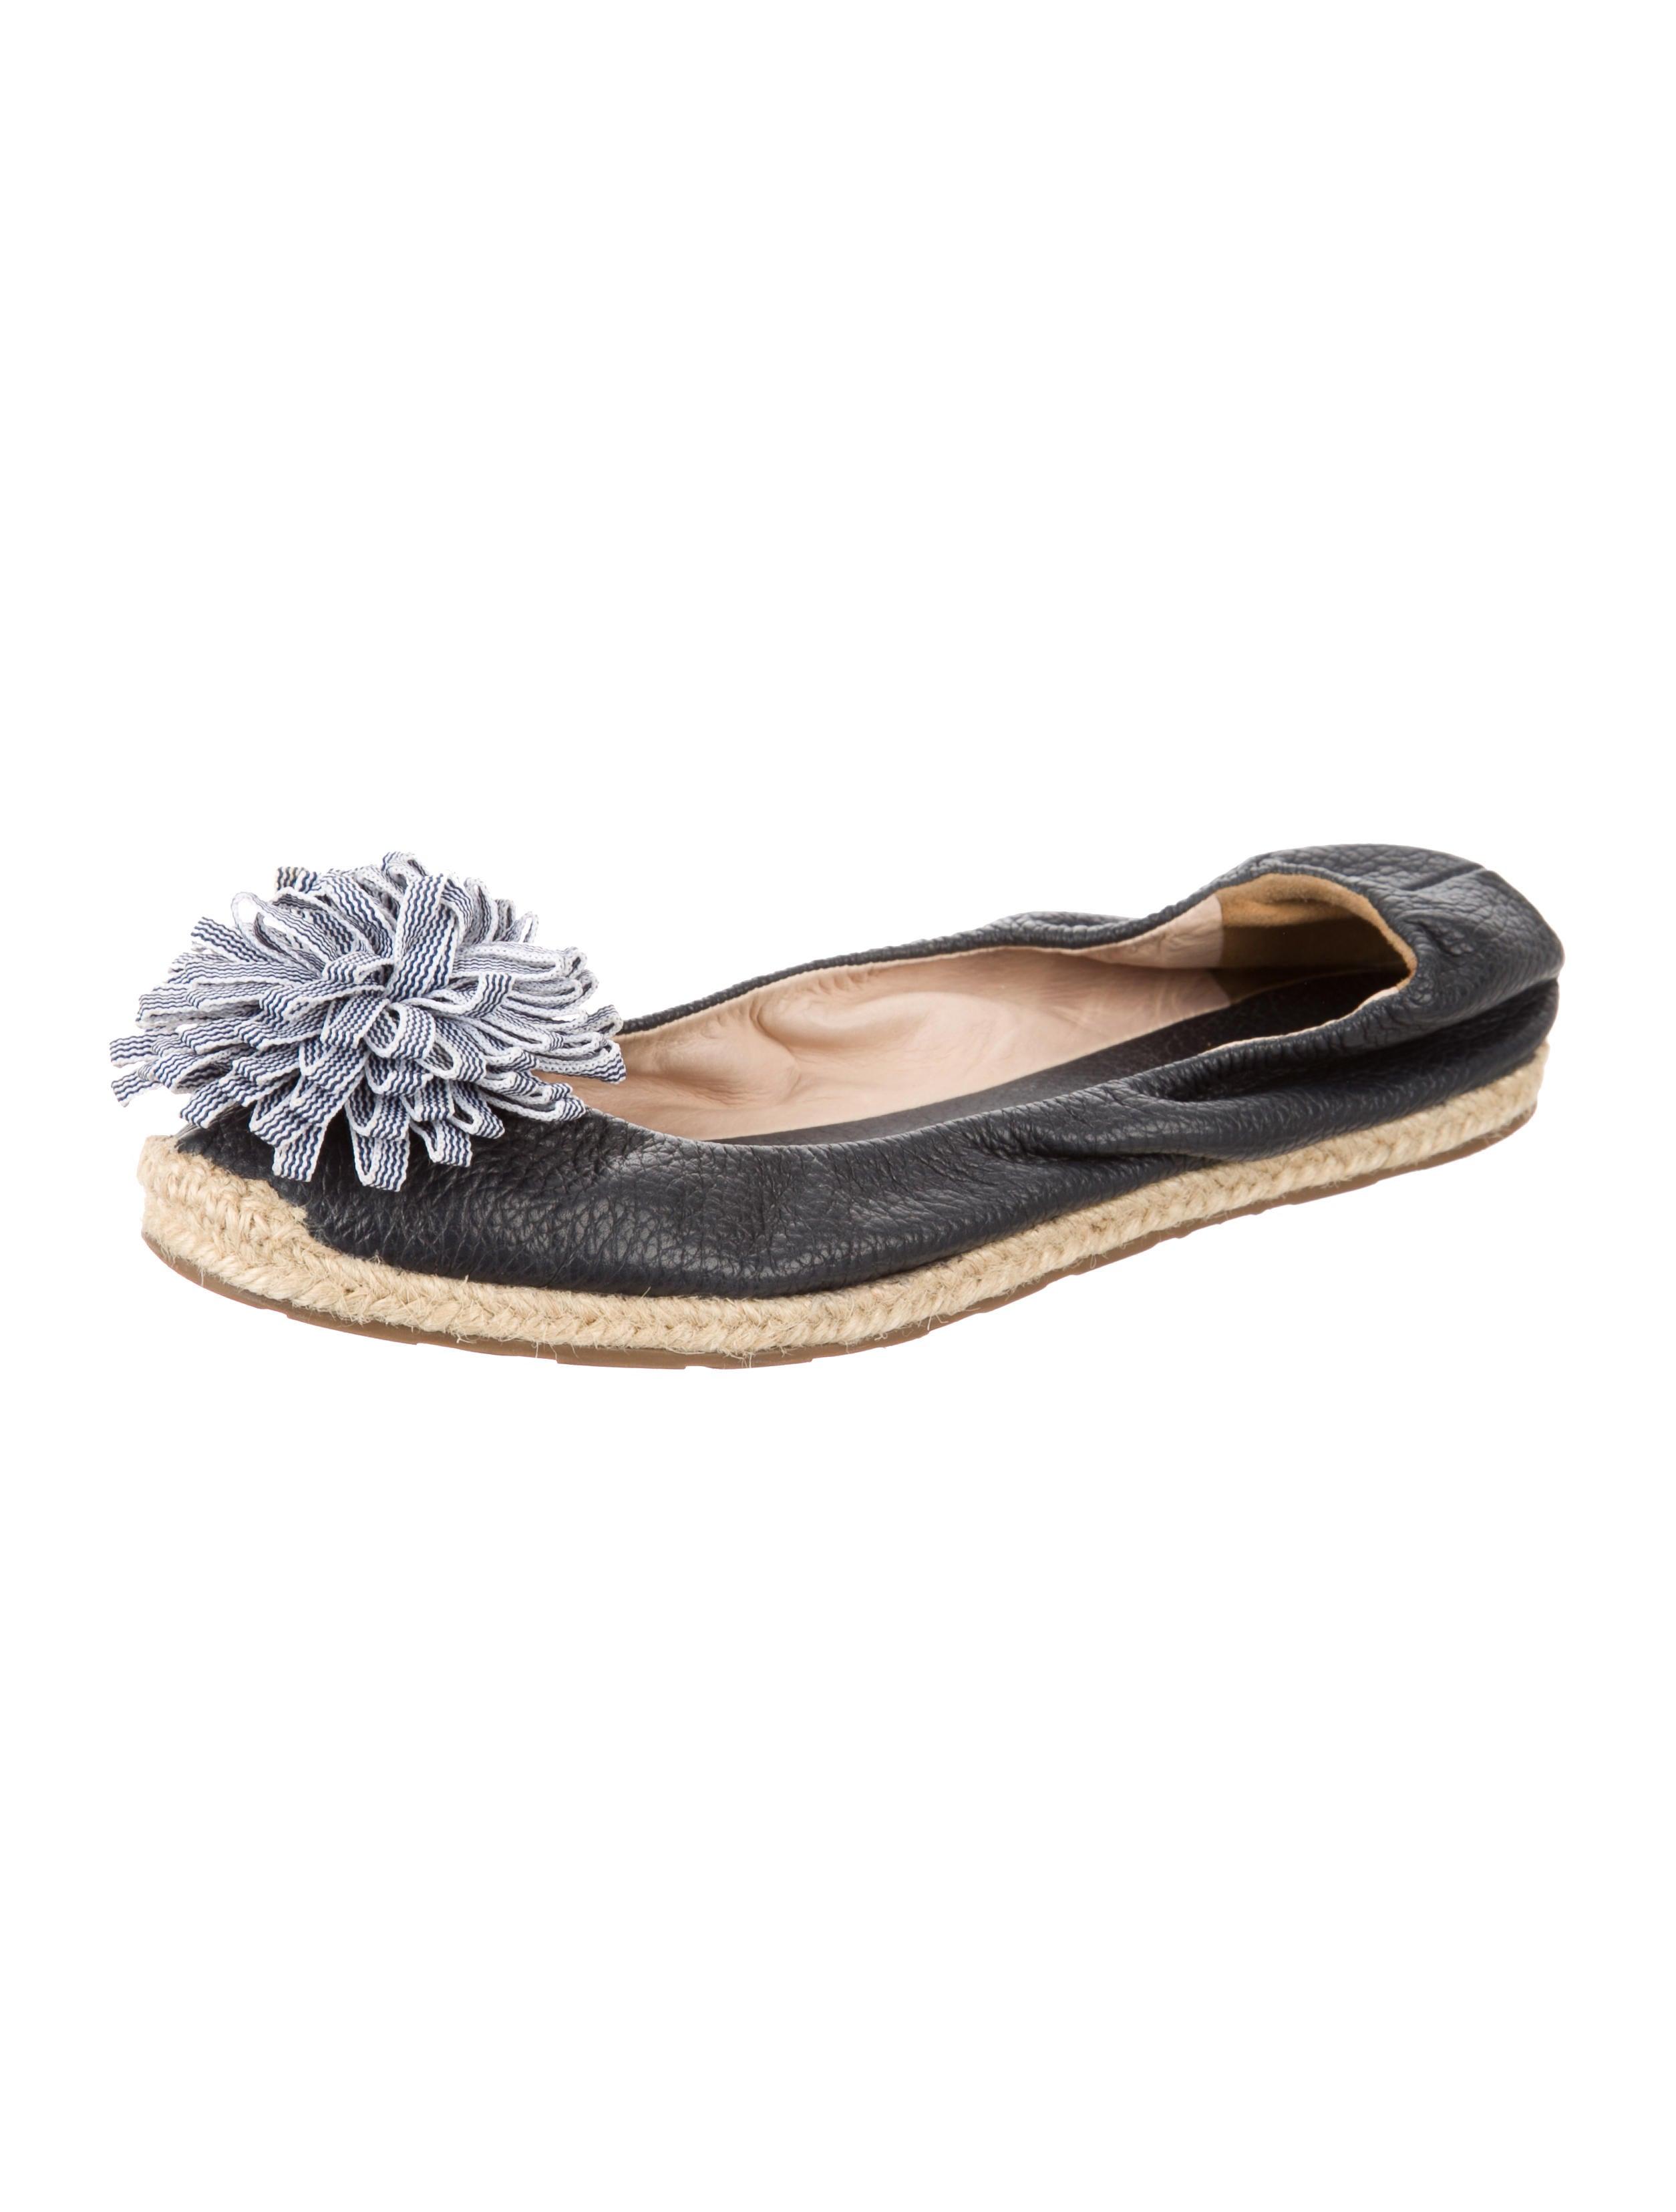 Kate spade new york pom pom espadrille flats shoes for Kate spade new york flats